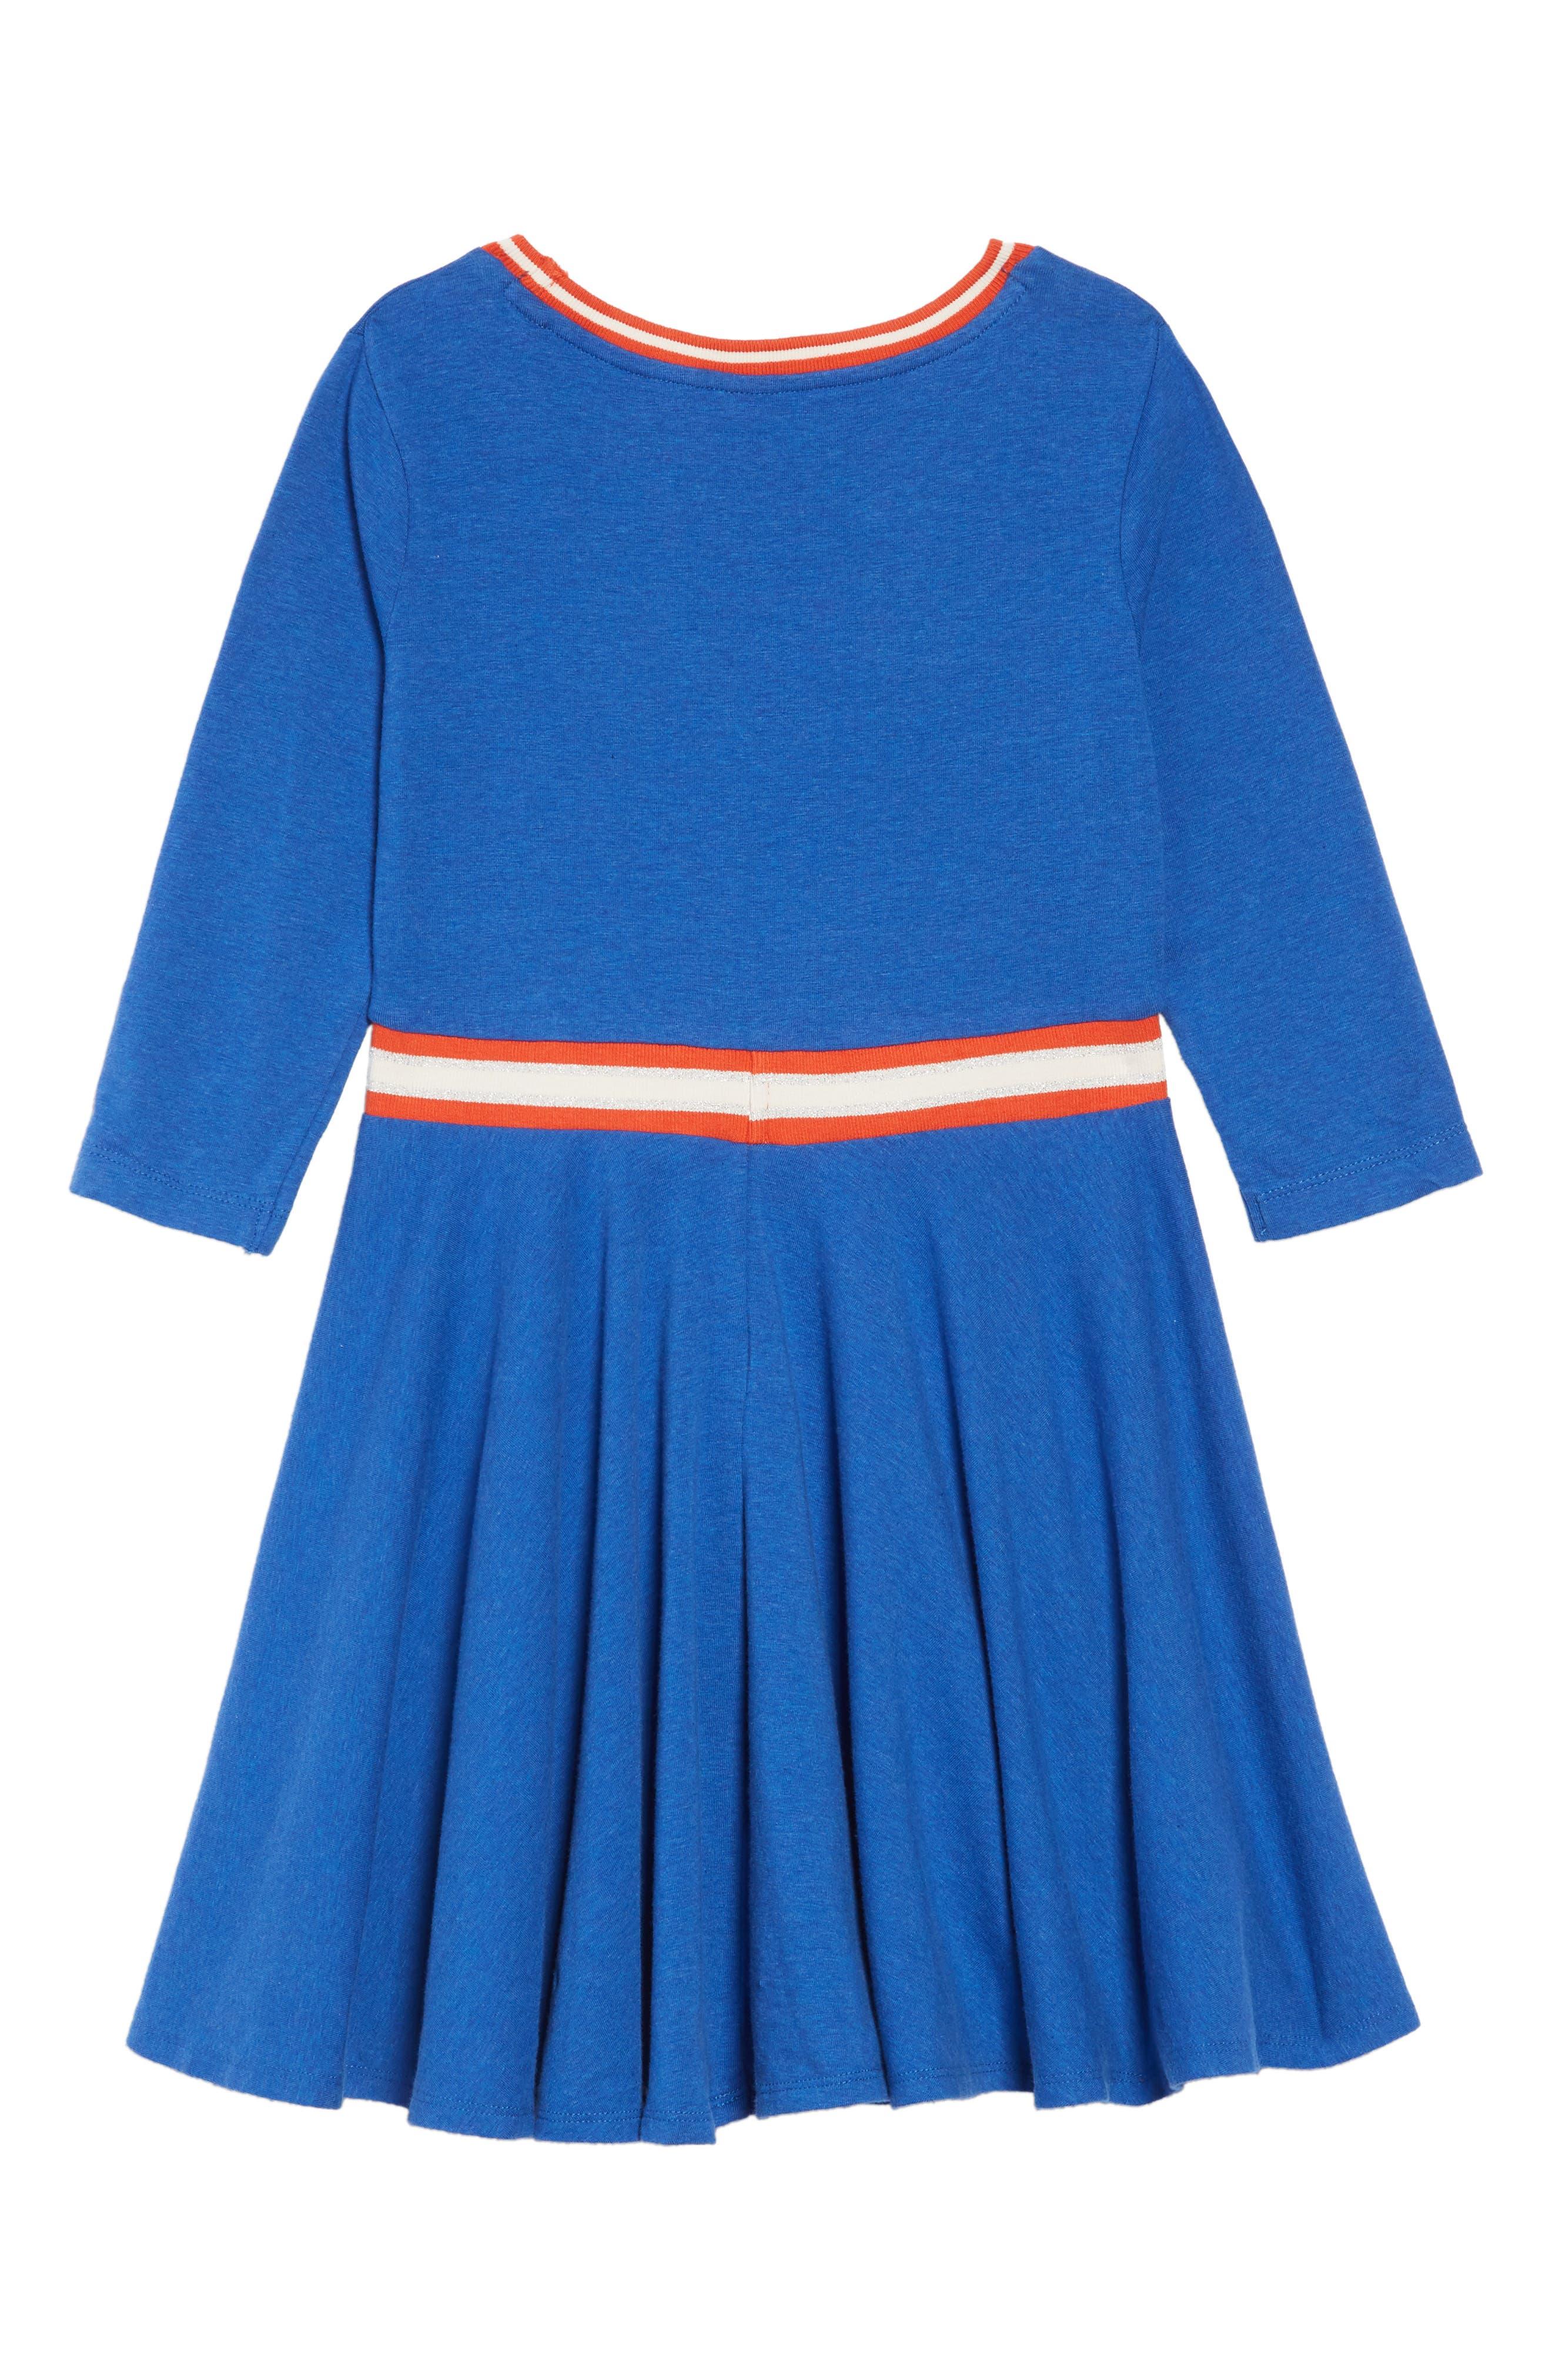 Color Change Sequin Skater Dress,                             Alternate thumbnail 2, color,                             424